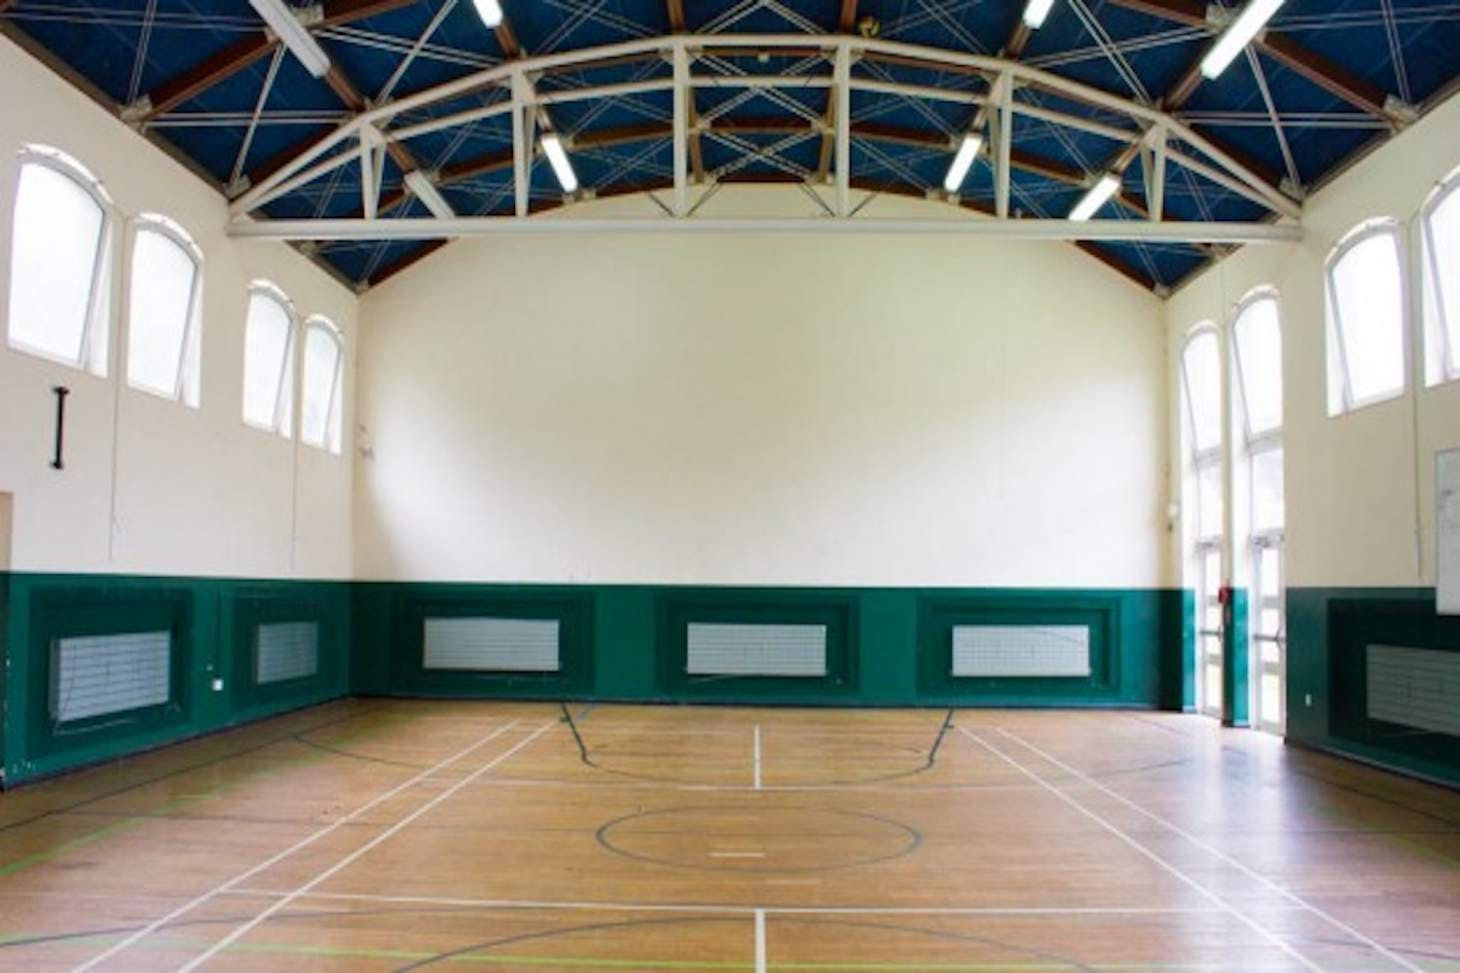 Phoenix Academy Court   Gymnasium basketball court